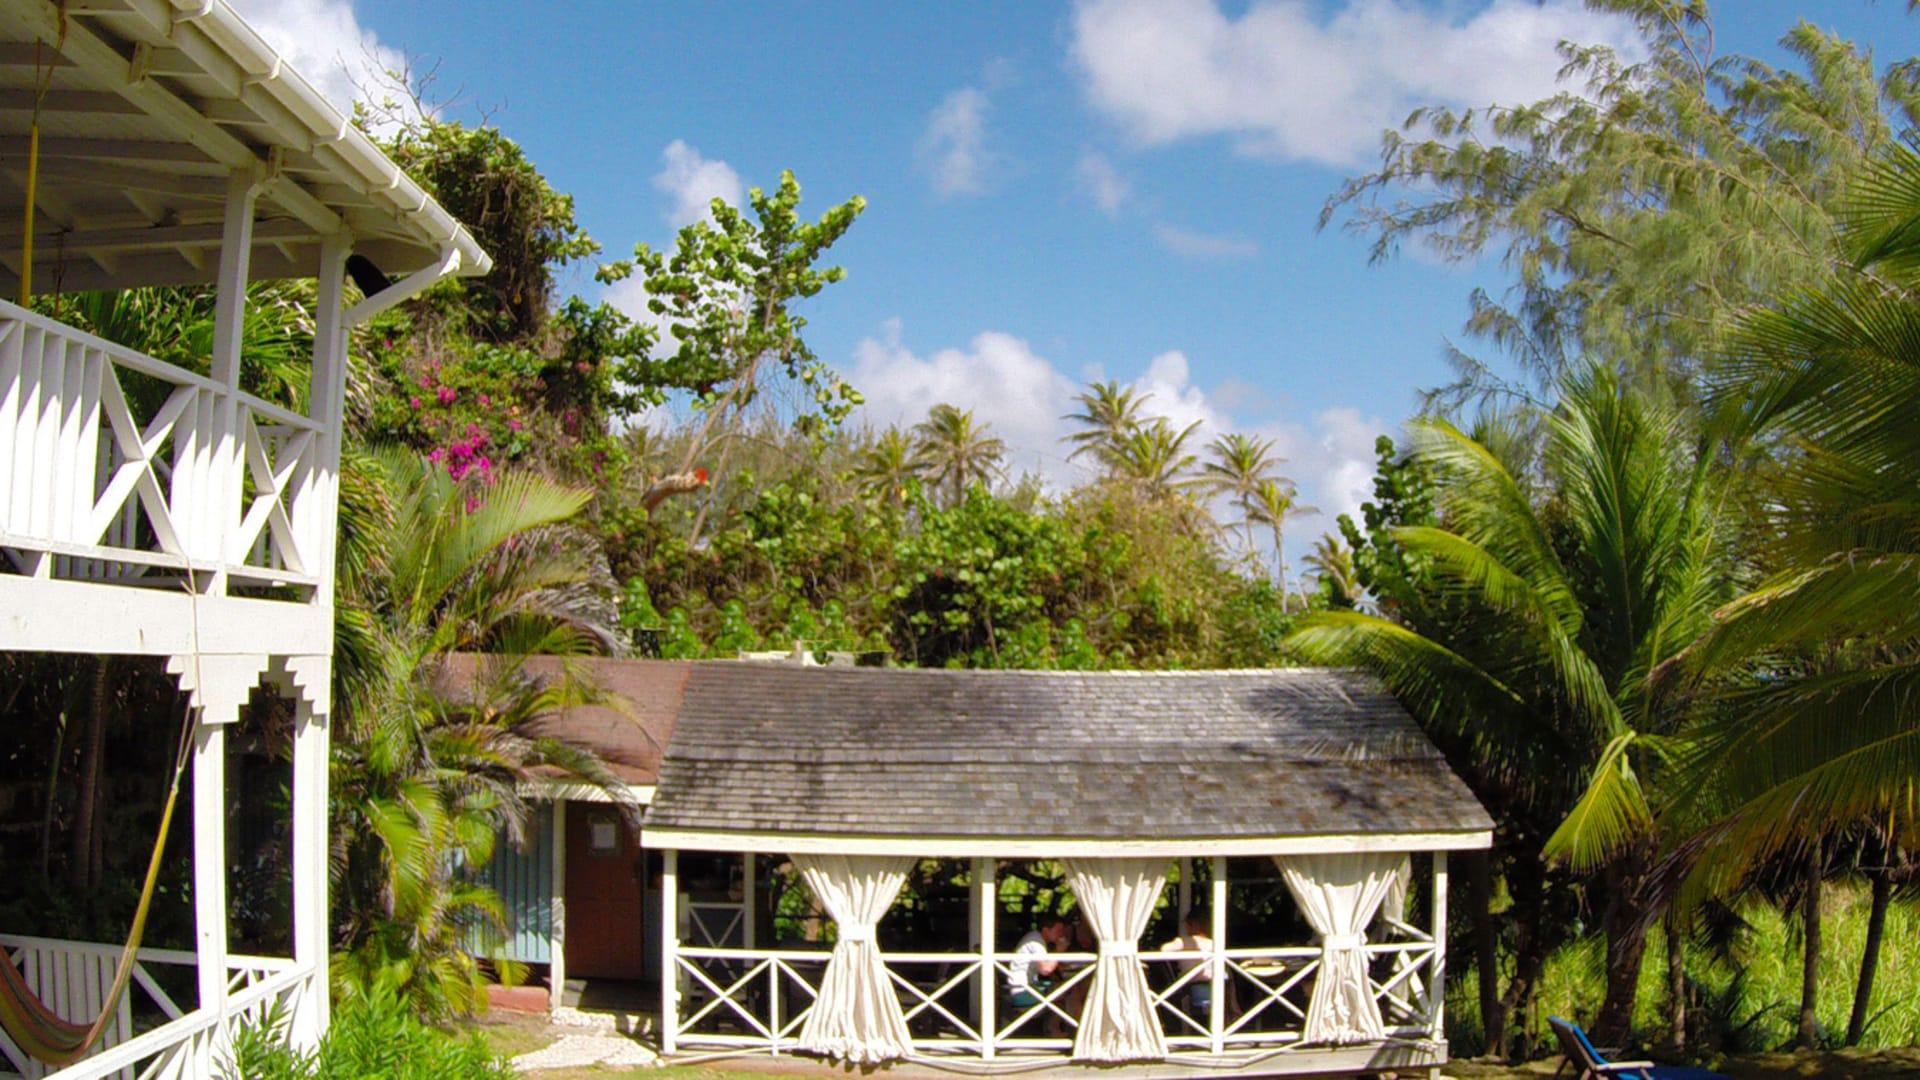 sea-u guest house inc • hotel • barbados luxury homes & real